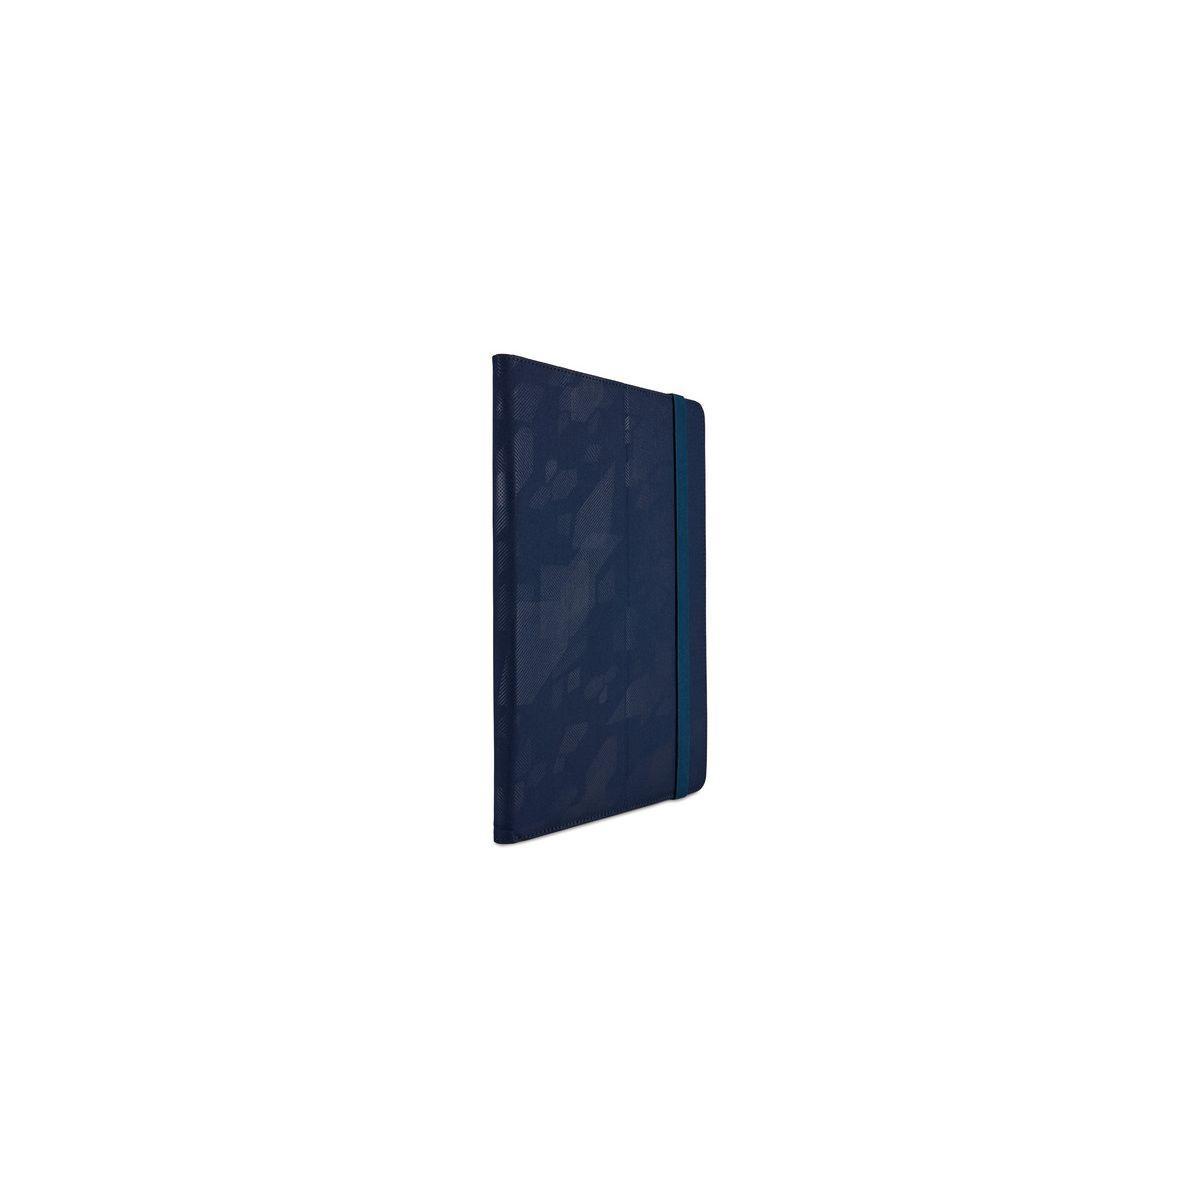 Etui tablette caselogic tablette 9-10'' bleu - livraison offerte : code liv (photo)